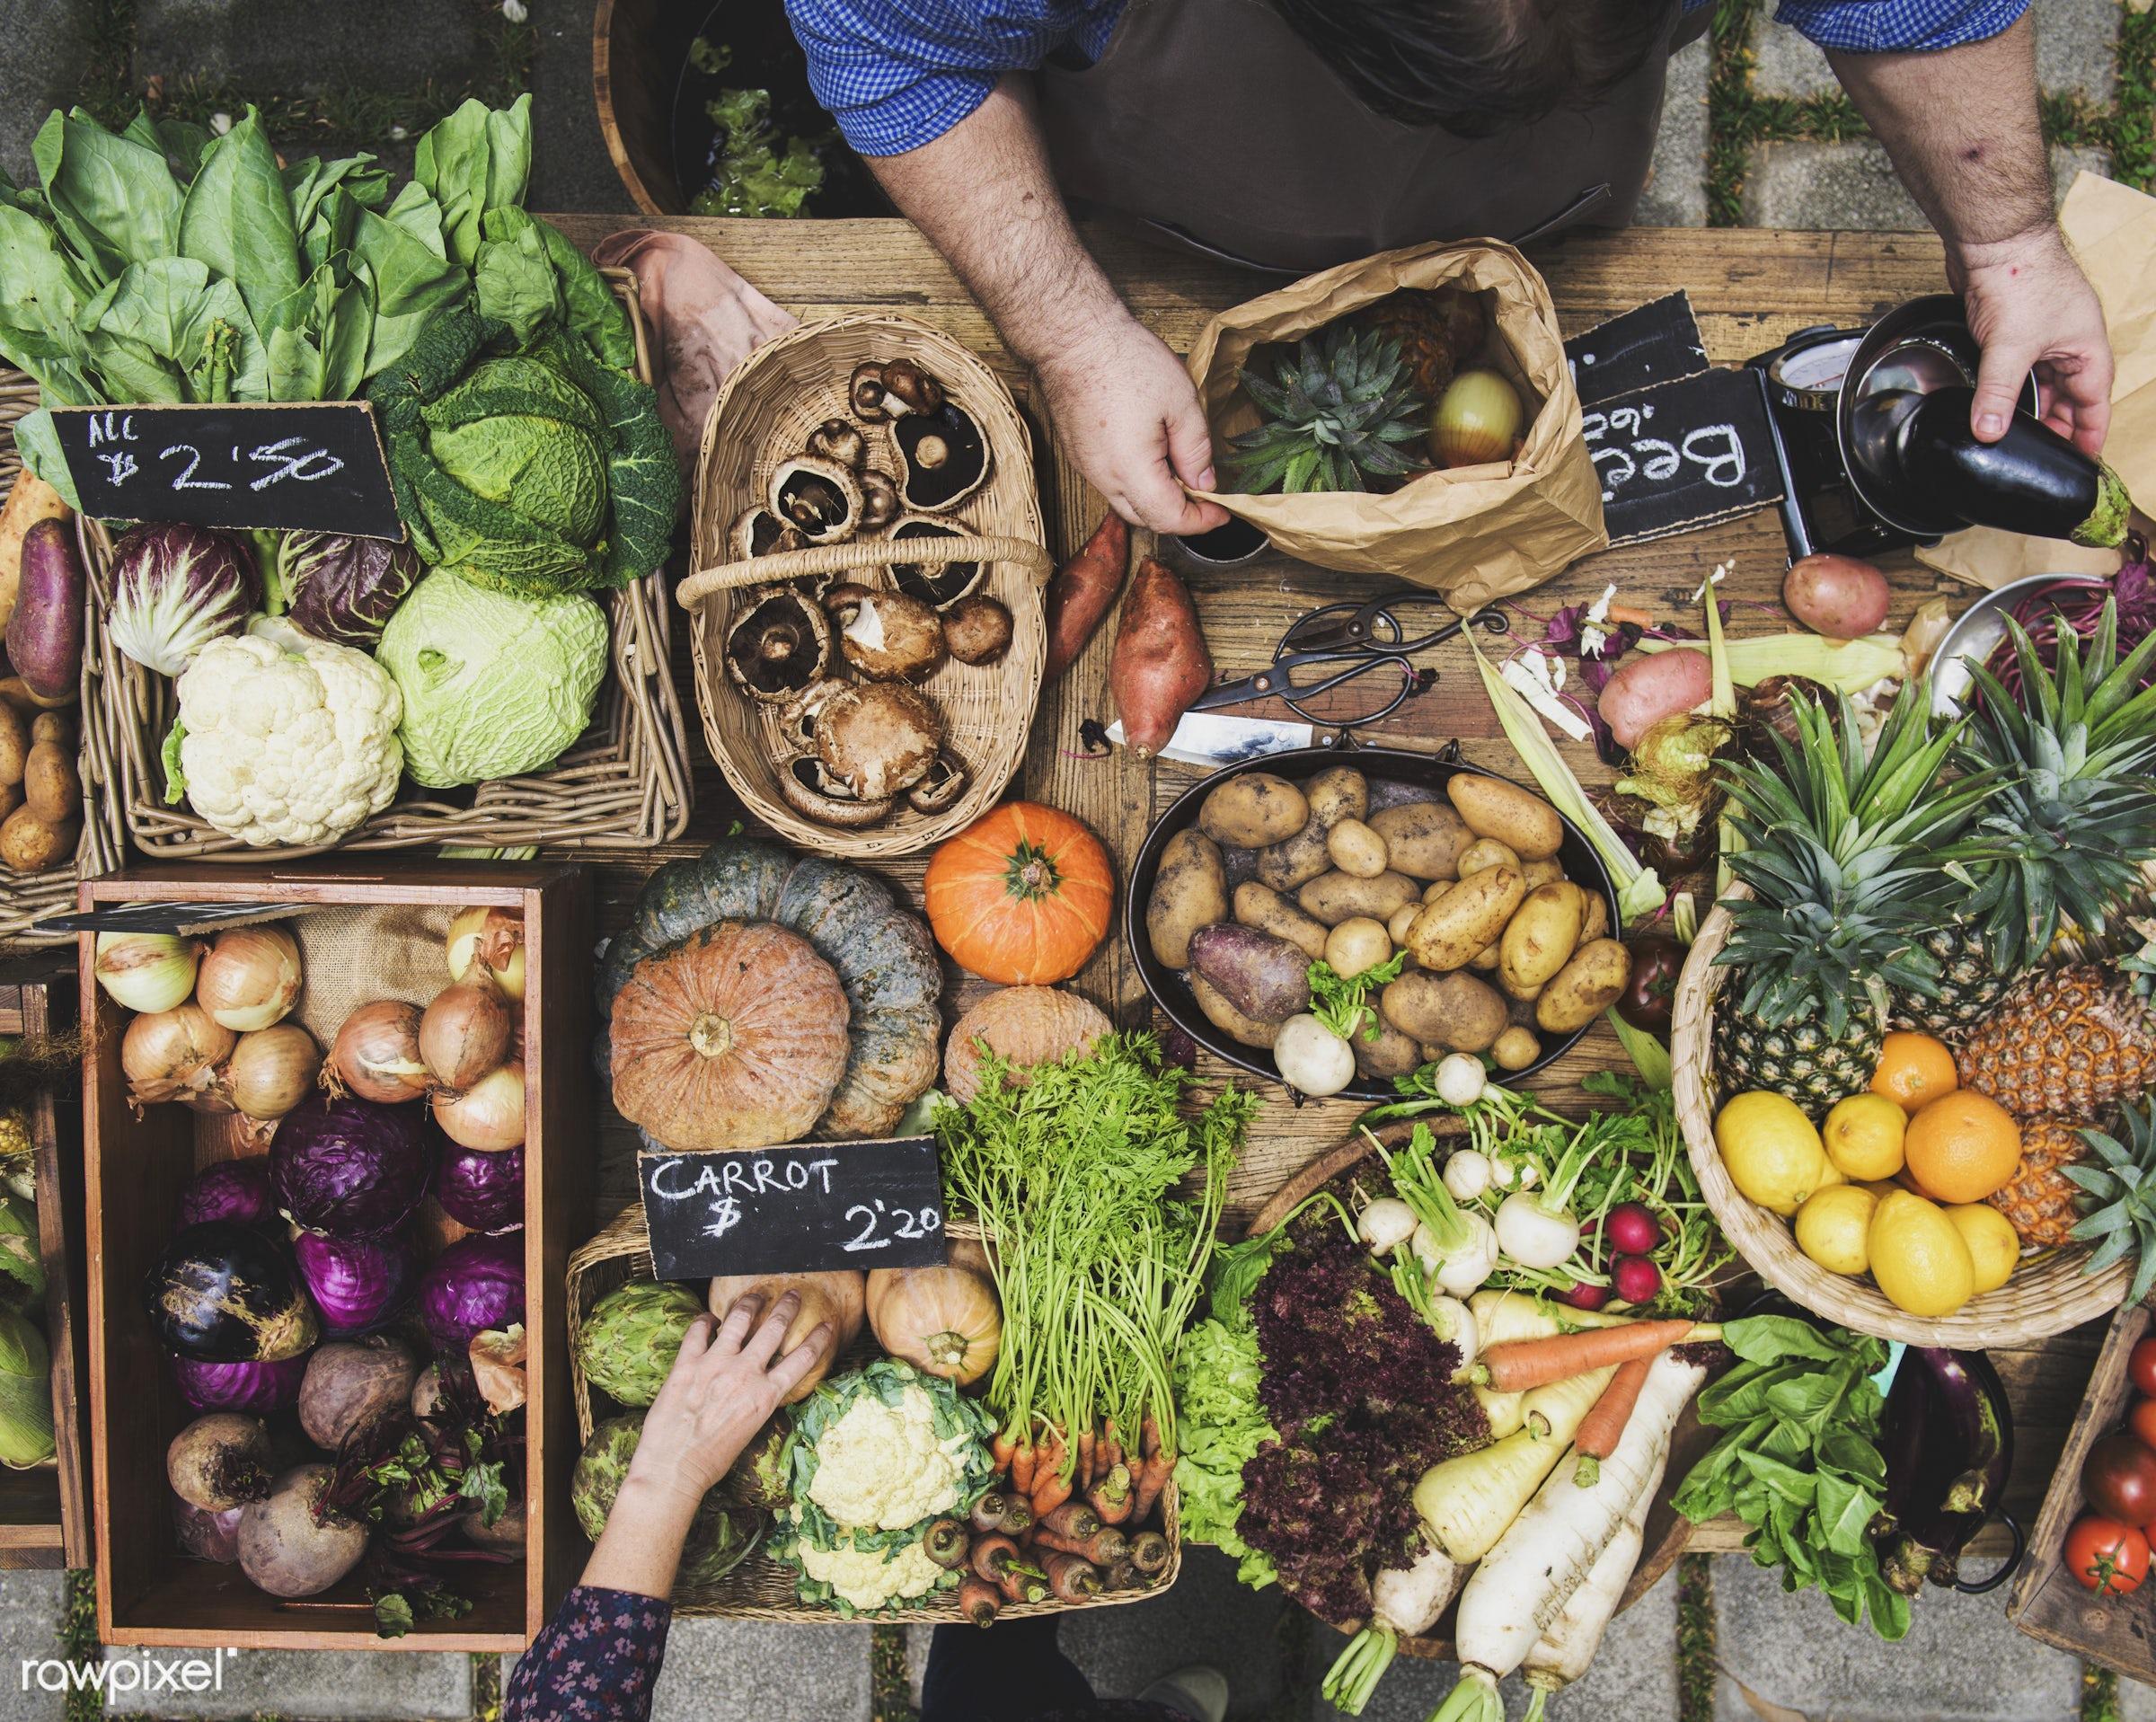 cuisine, variation, gastronomy, type, kind, ingredients, hands, buying, veggie, gourmet, selling, wooden bucket, vegetables...